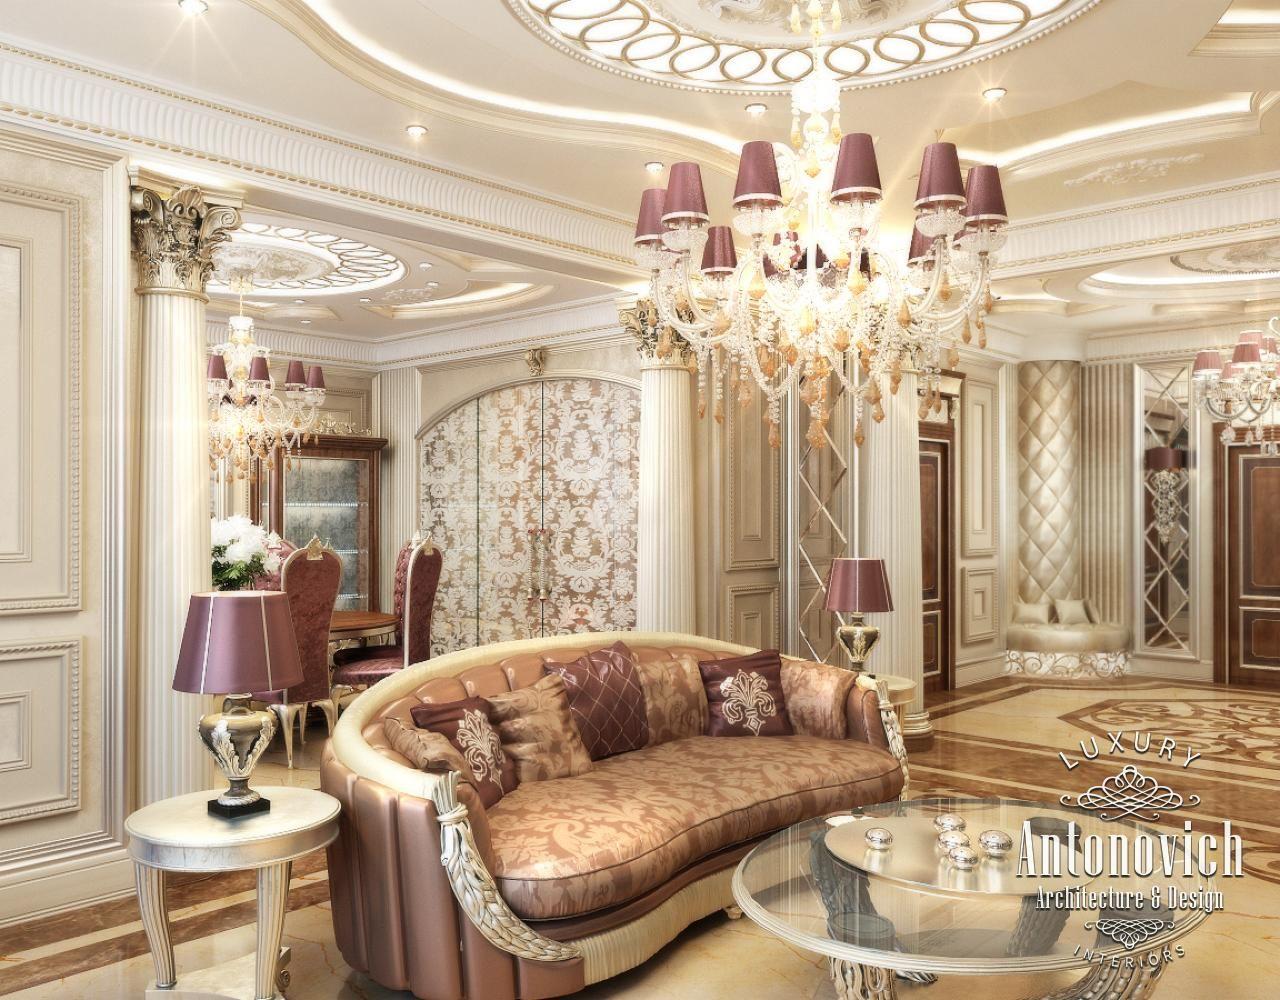 Apartment interior design in dubai down tower dubai for Living room ideas dubai